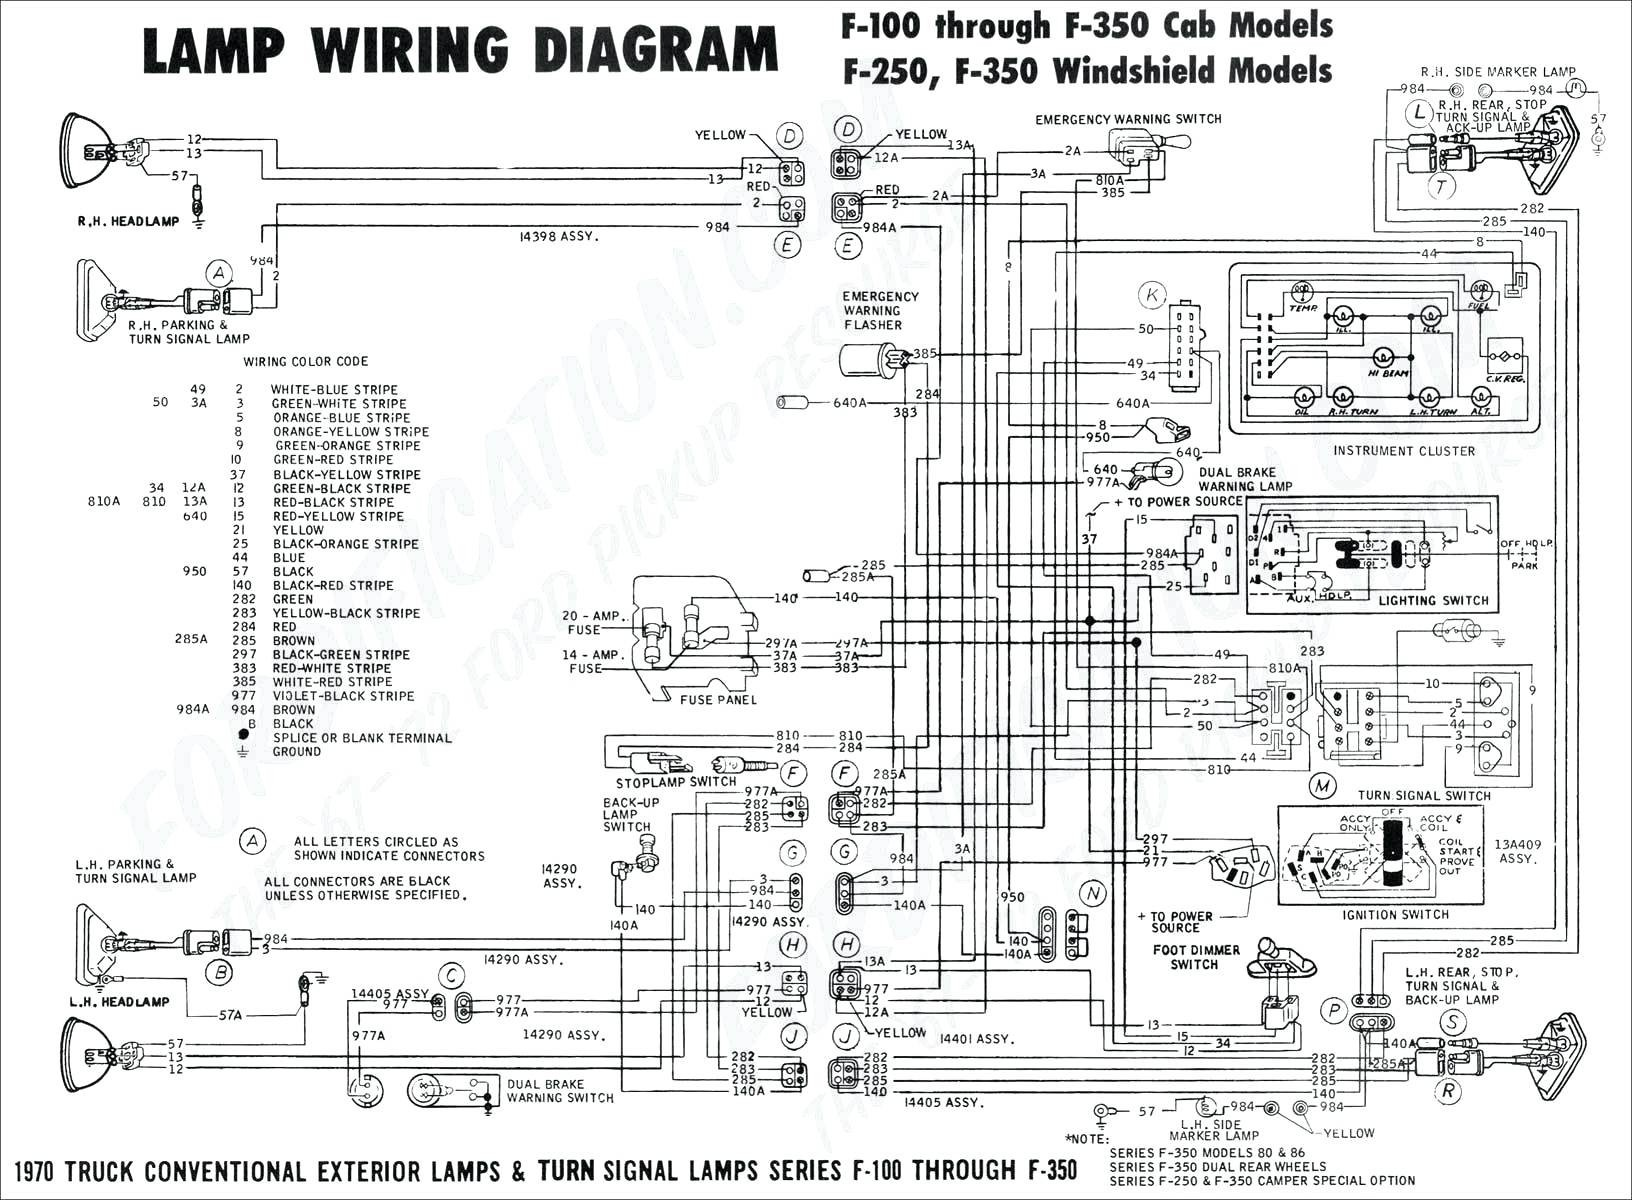 2000 ford ranger engine diagram amana ptac control board wiring explorer my